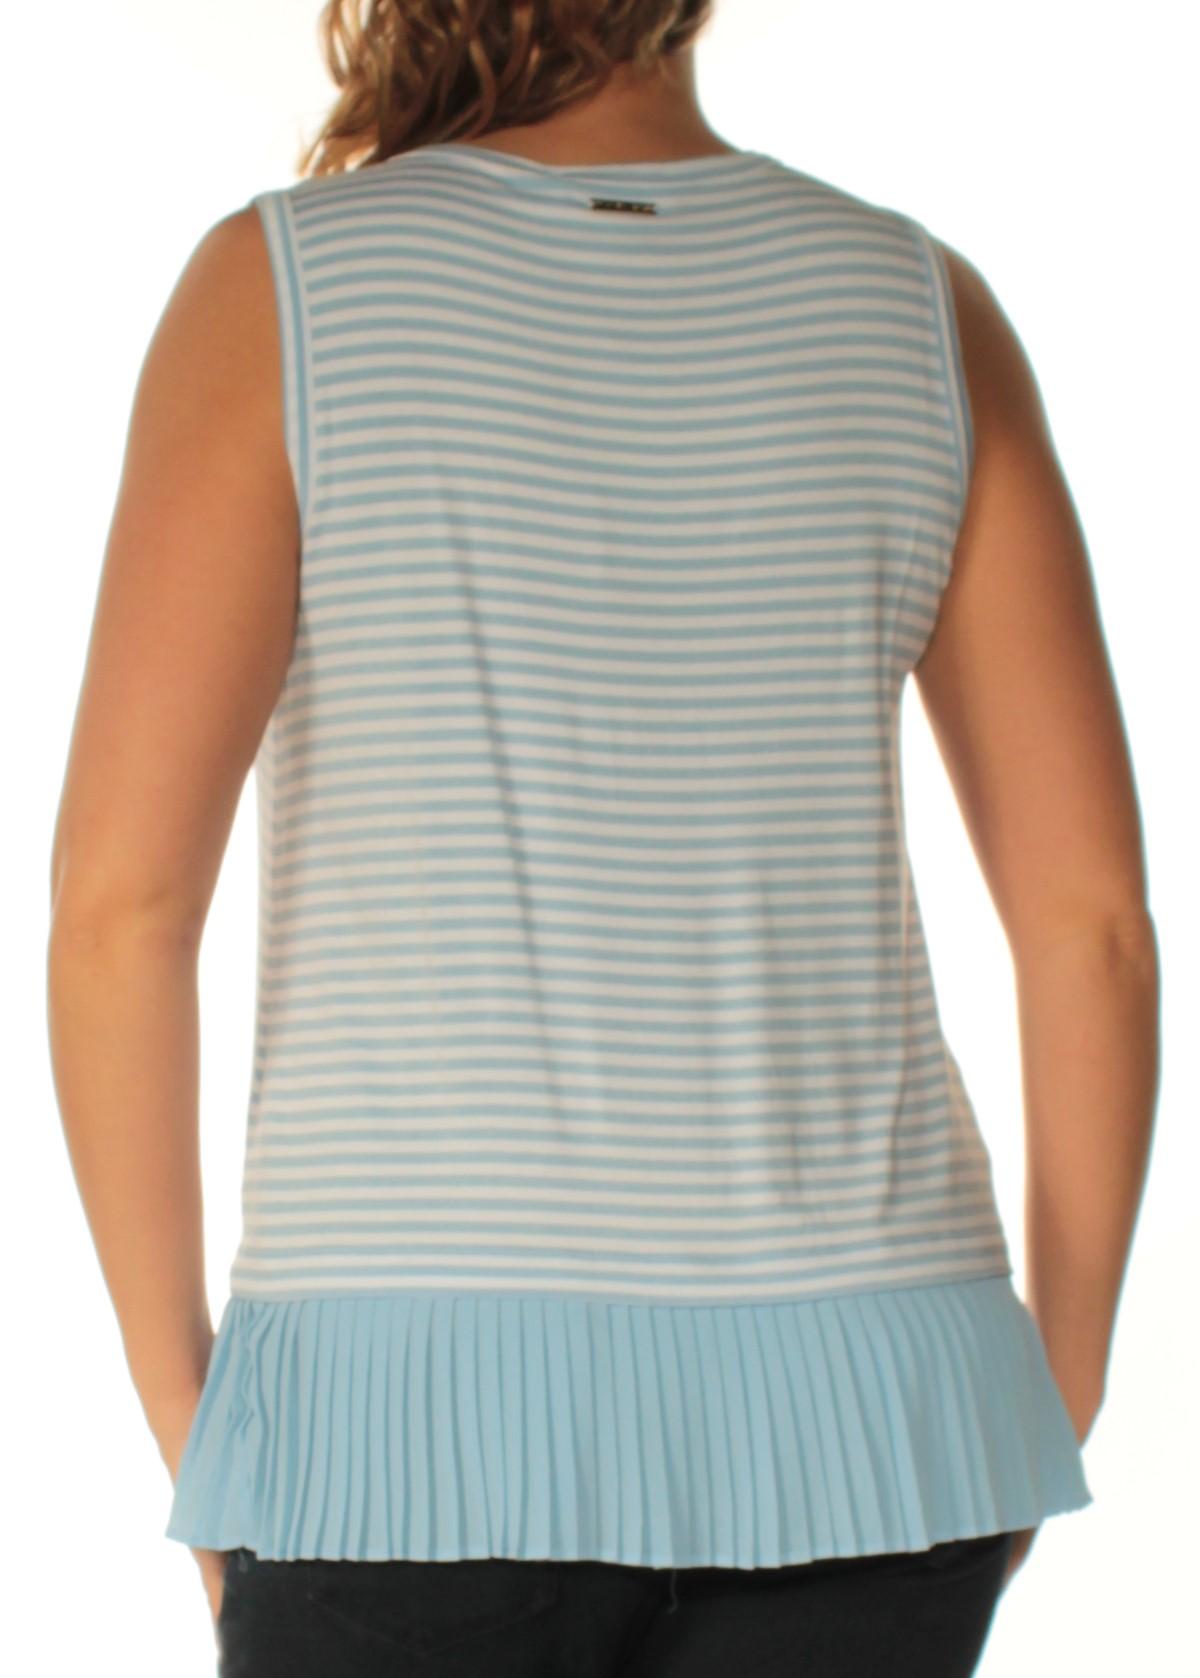 7059341a1f2763 MICHAEL KORS  64 Womens New 1609 Blue White Striped Sleeveless Top L ...